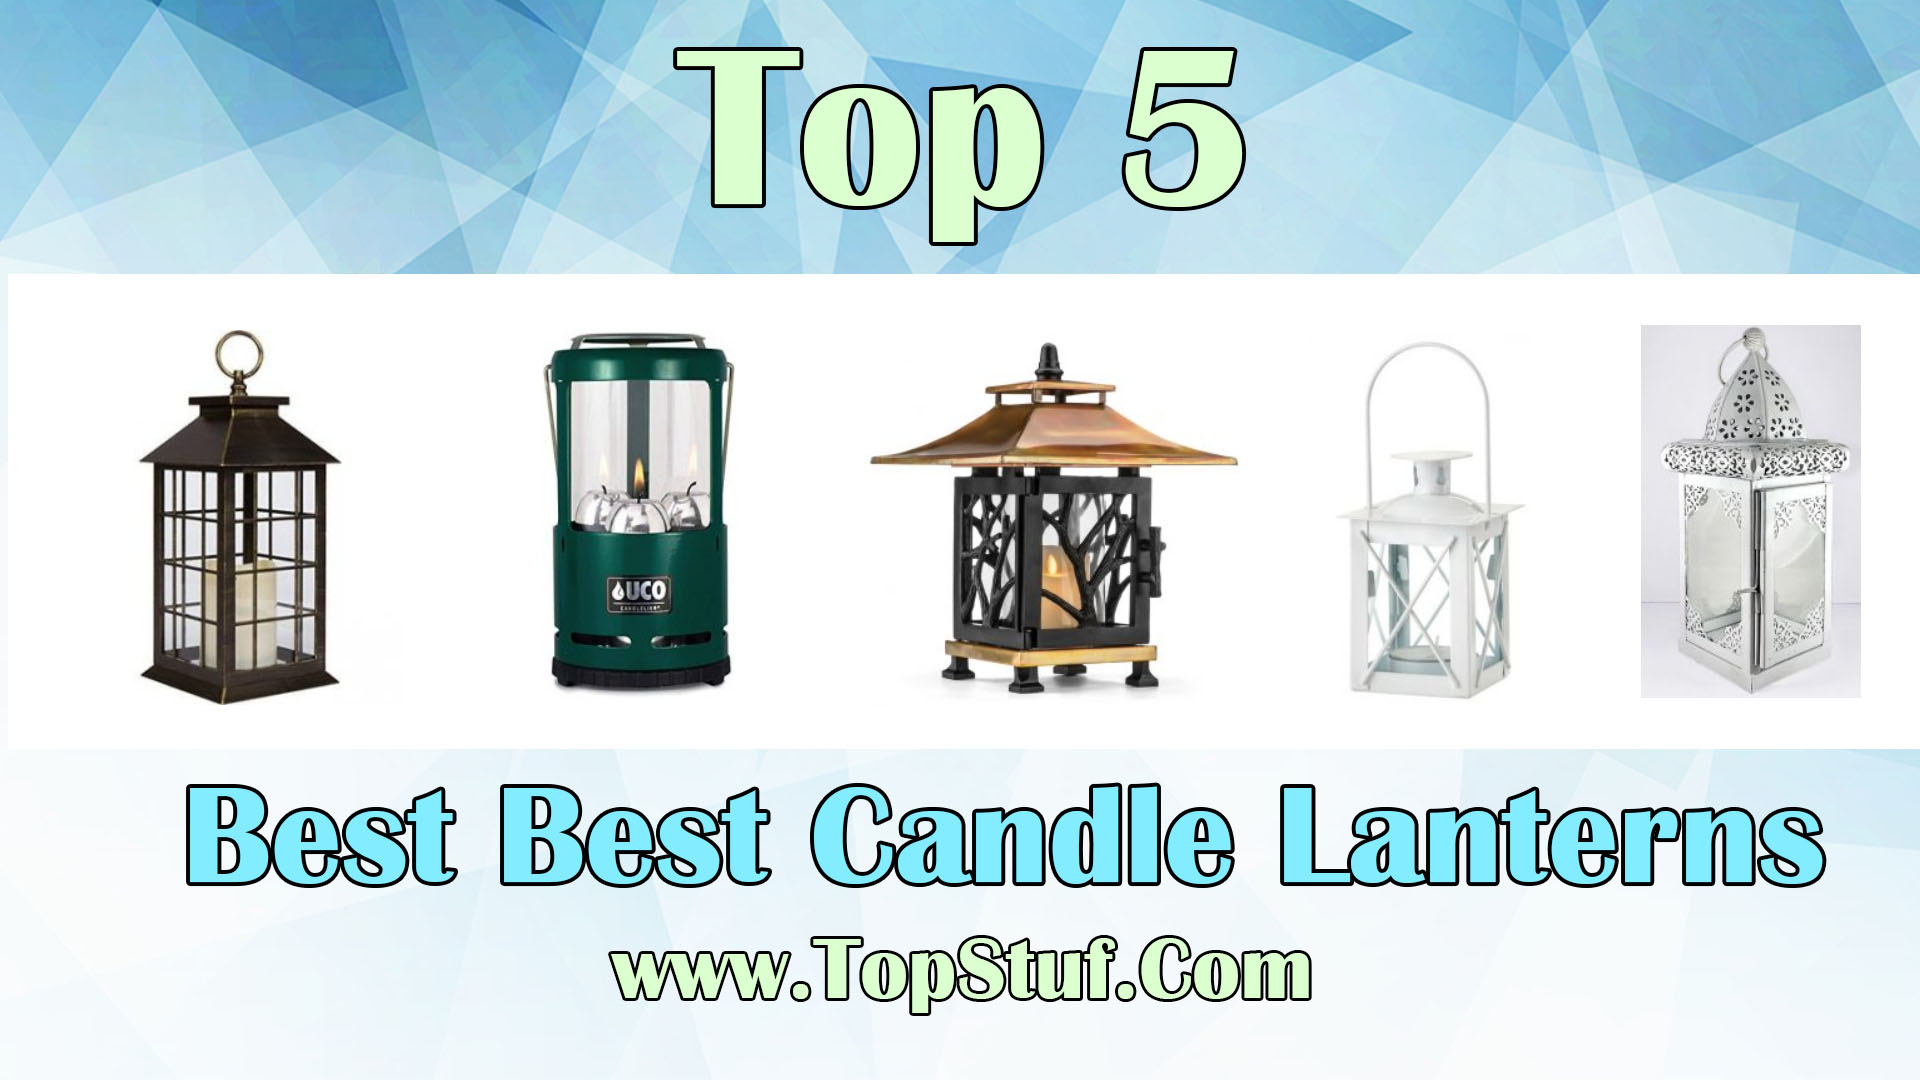 Best Candle Lanterns